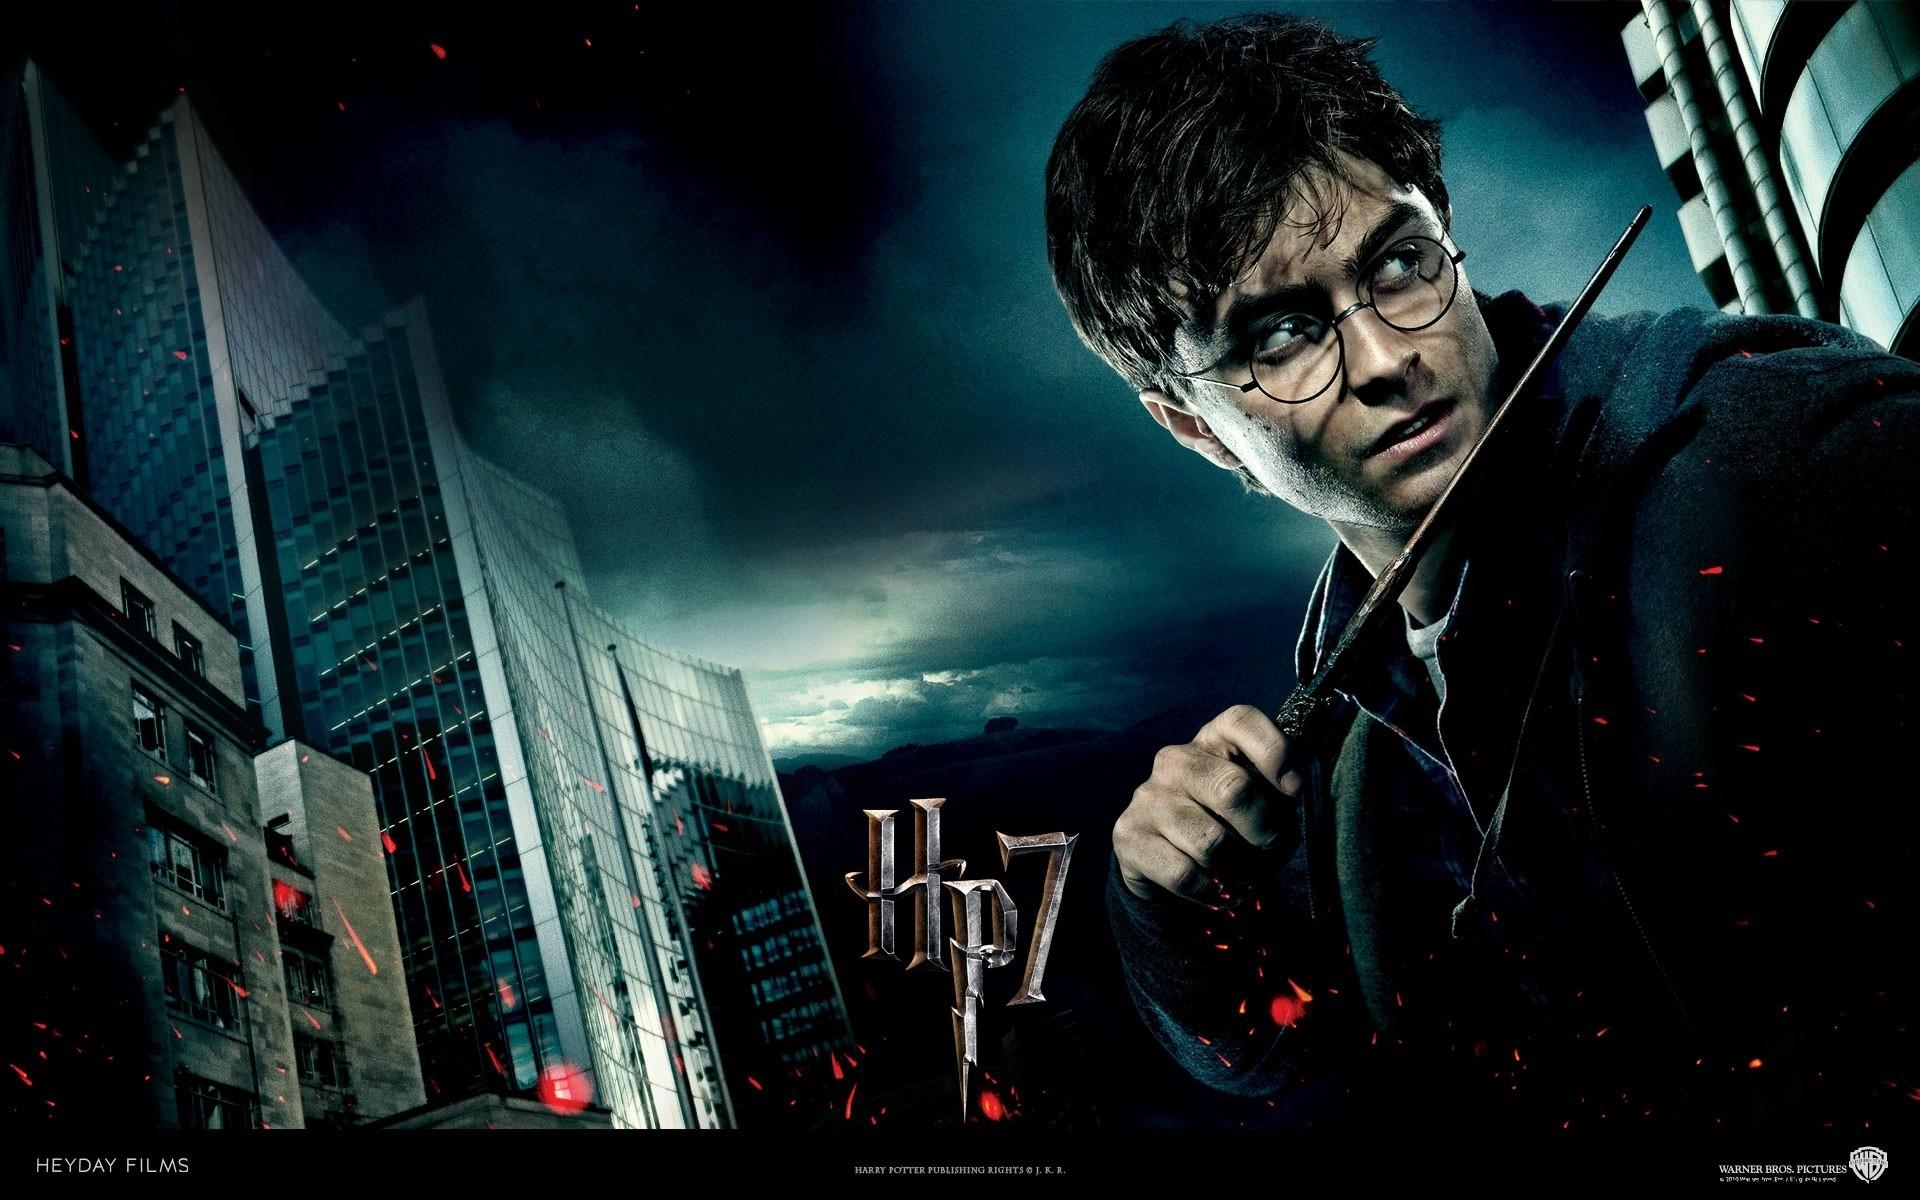 Harry Potter 7 Wallpaper Download 1920x1200